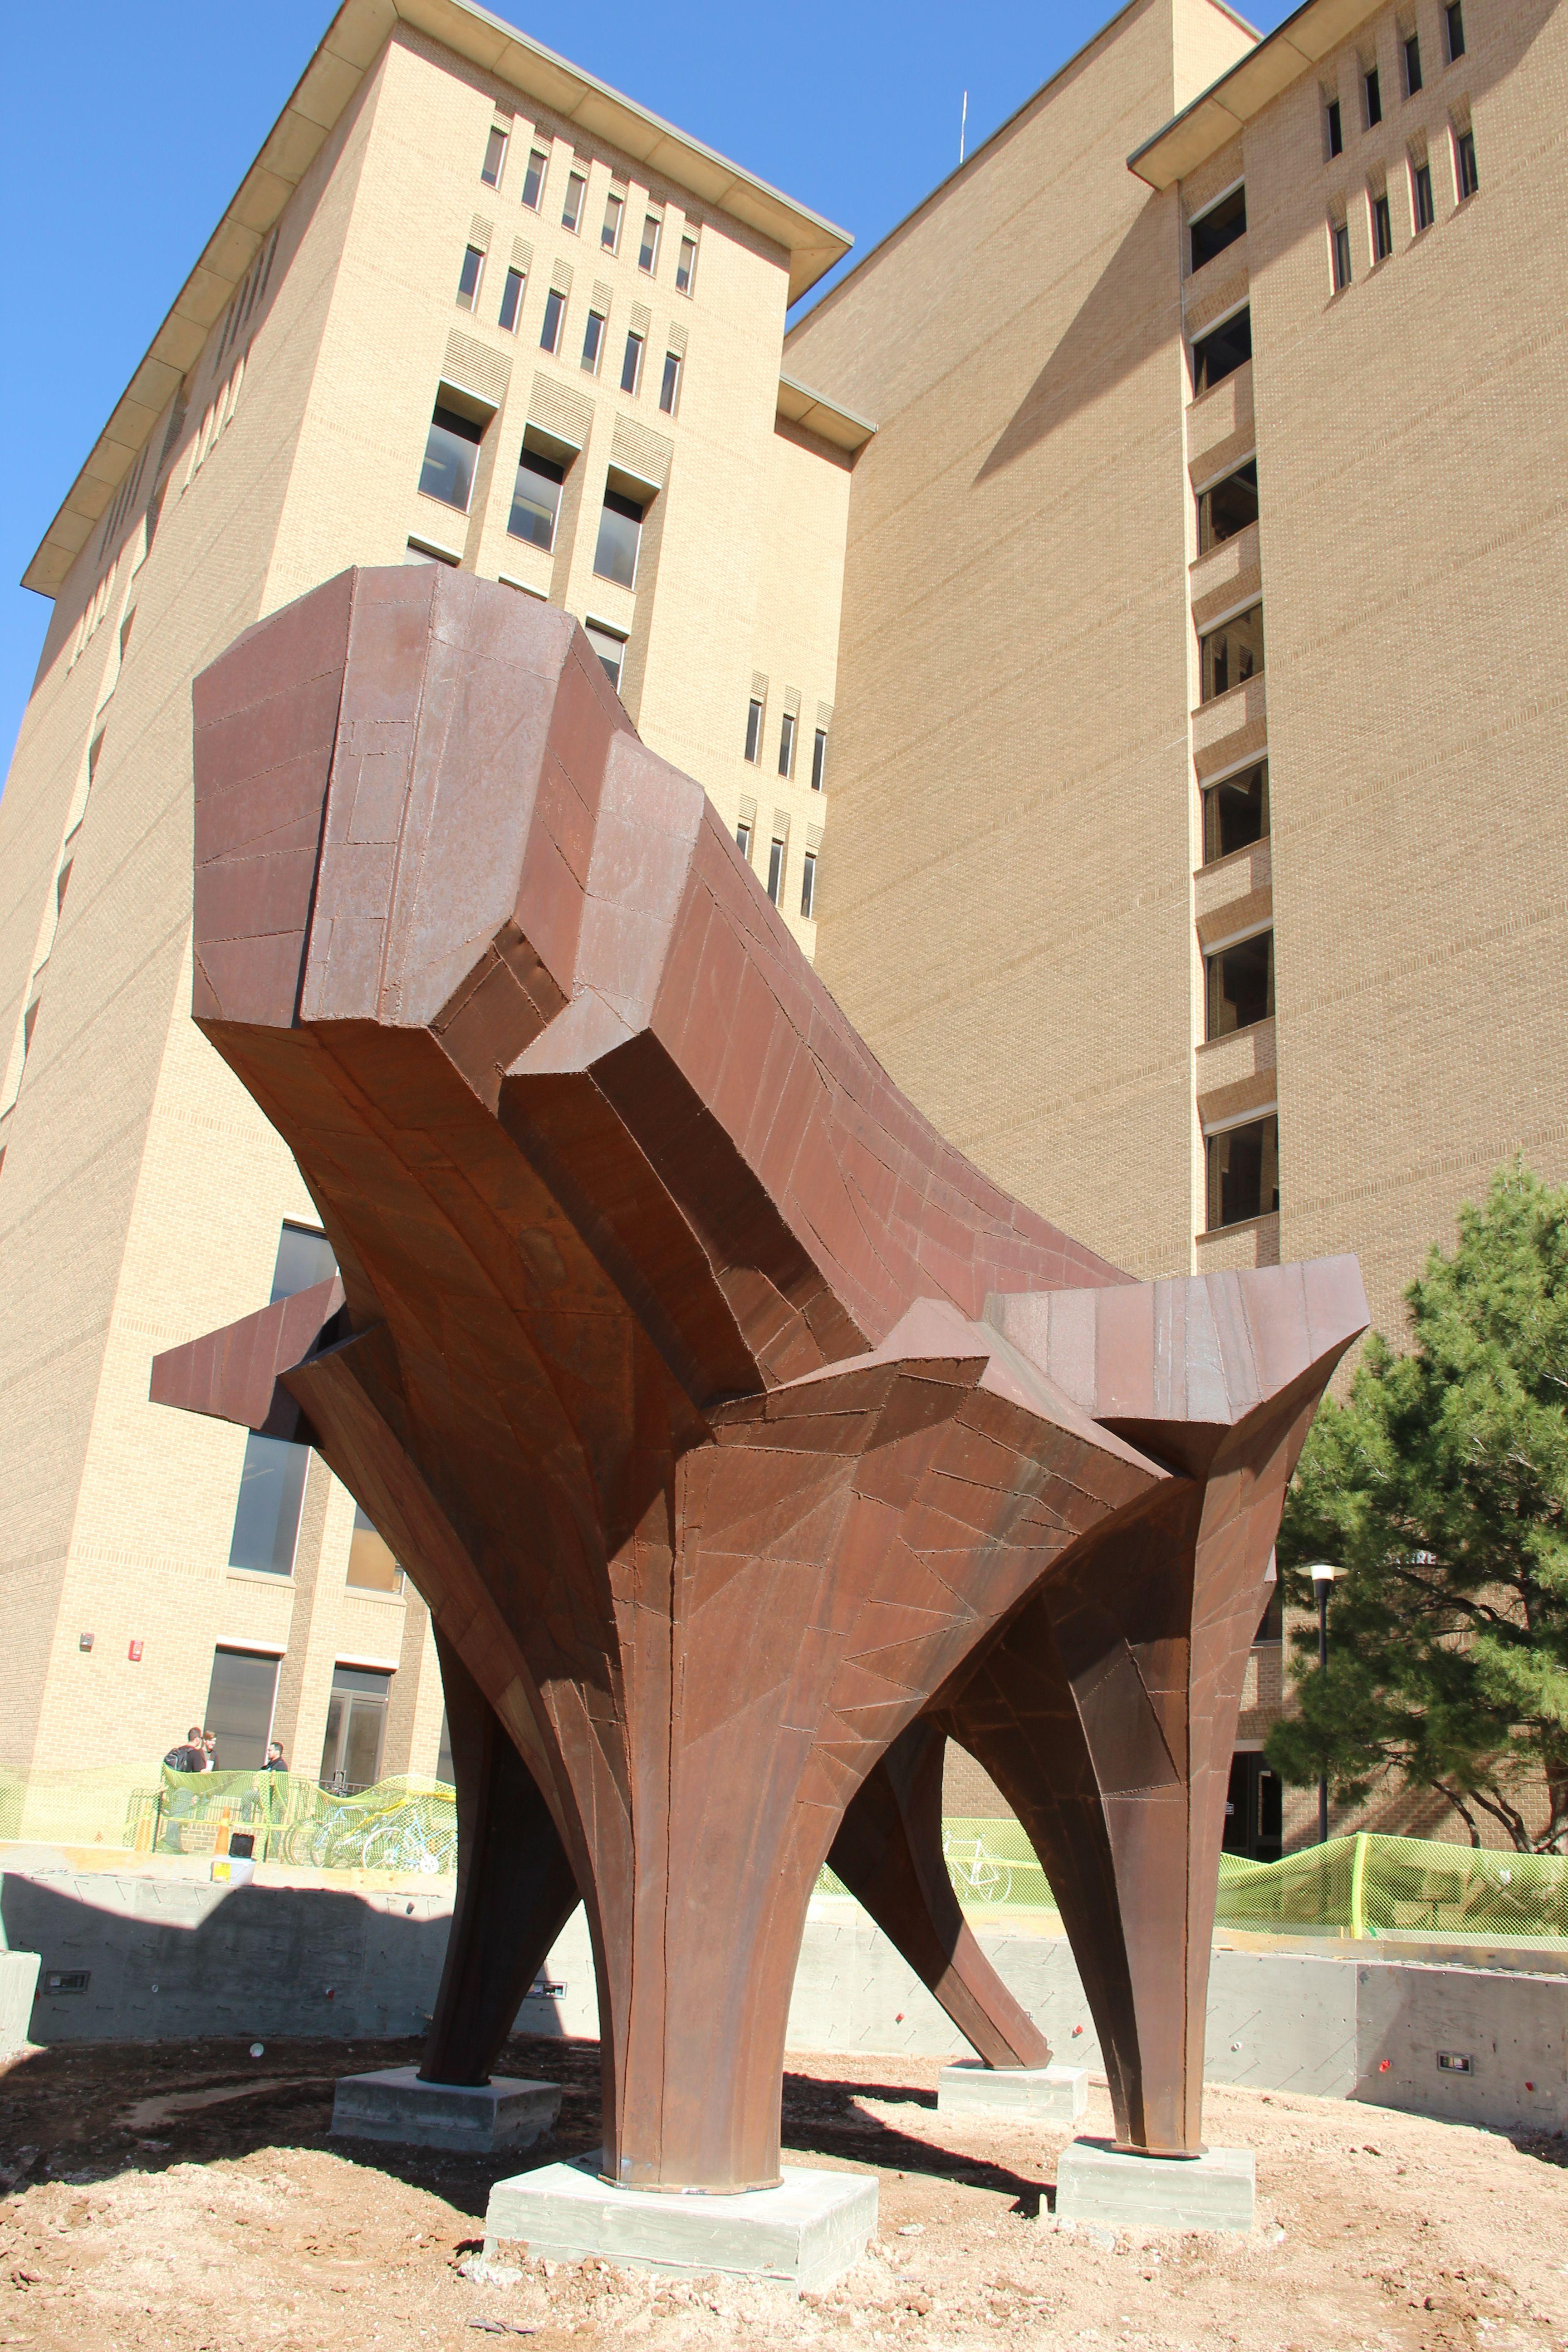 Discover New Art At Texas Tech S Public Art Collection Steel Architecture Texas Tech Texas Tech University